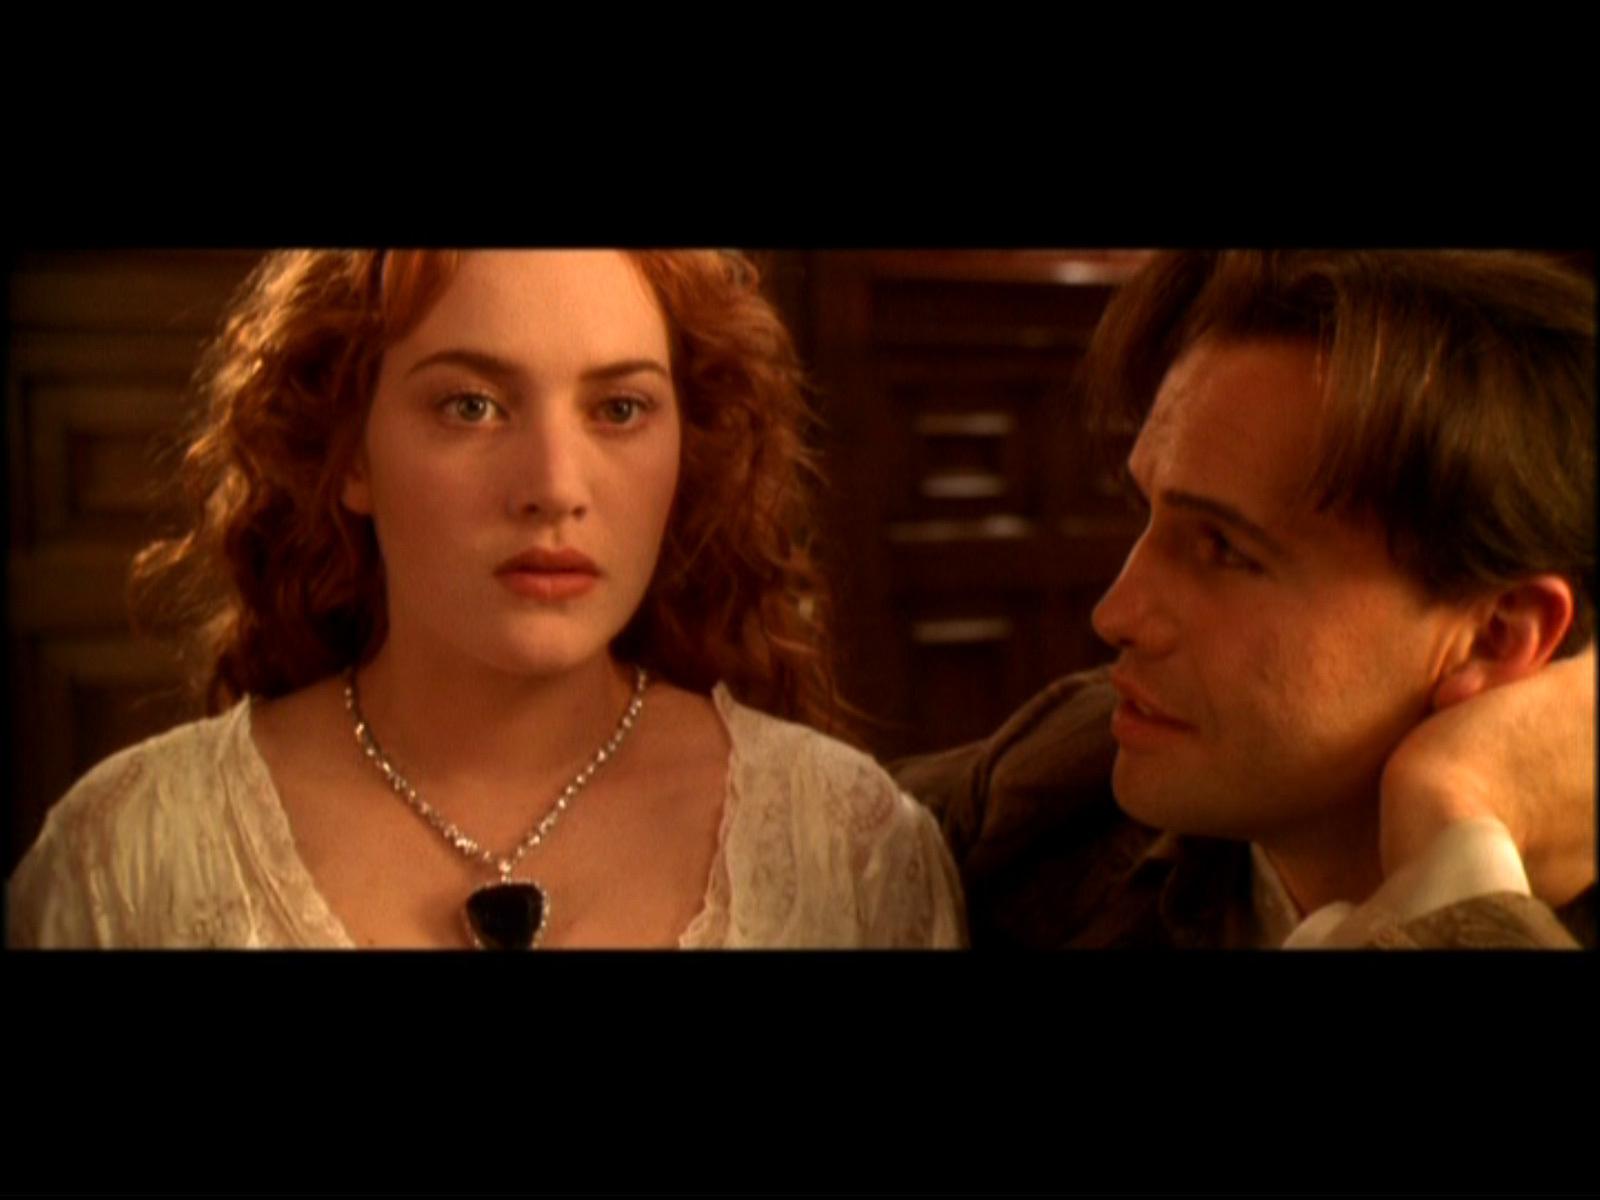 http://2.bp.blogspot.com/-GmssJrEGeRU/T8XqT3zBkAI/AAAAAAAADJU/4-LZhp6bdW0/s1600/Titanic-Kate-Winslet-perla+dell\'oceano+-+gioiello+-+non+si+dice+piacere.jpg